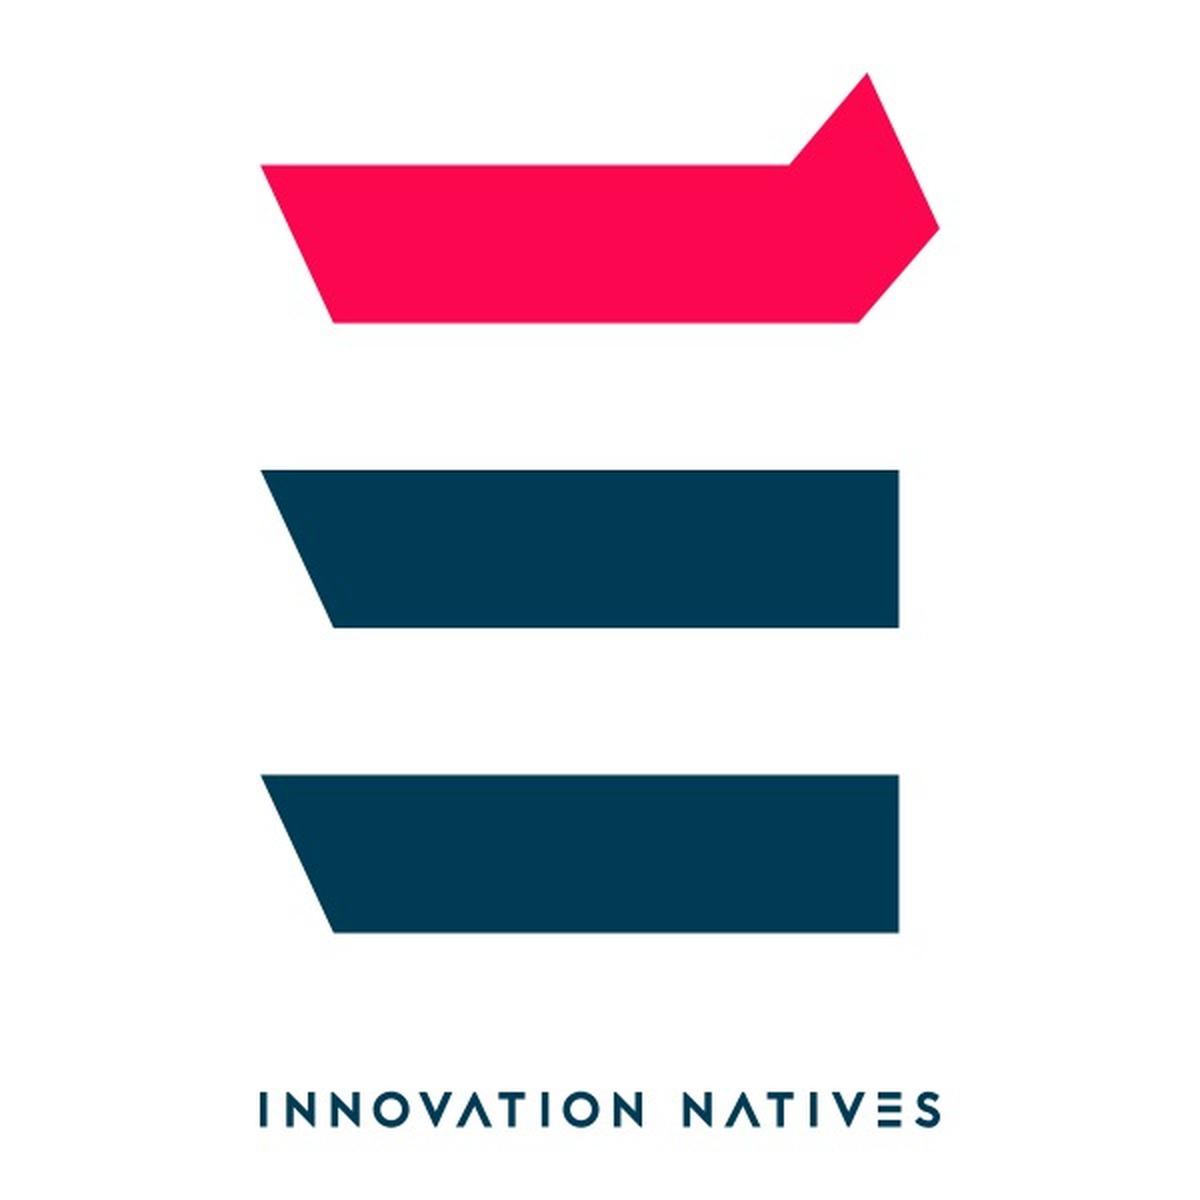 Innovation Natives GmbH & Co. KG